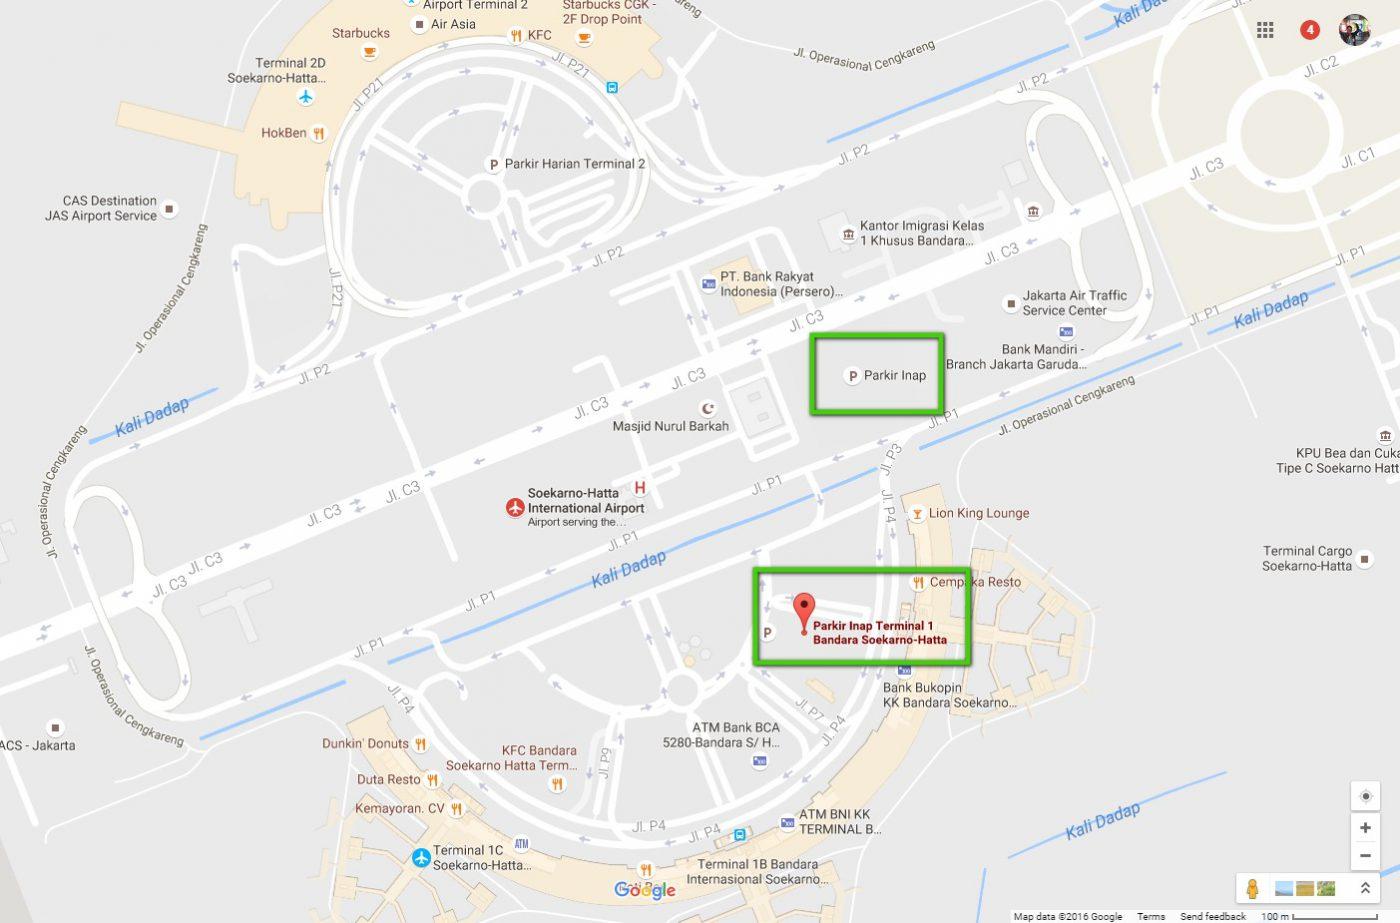 parkir-inap-bandara-soekarno-hatta-terminal-1